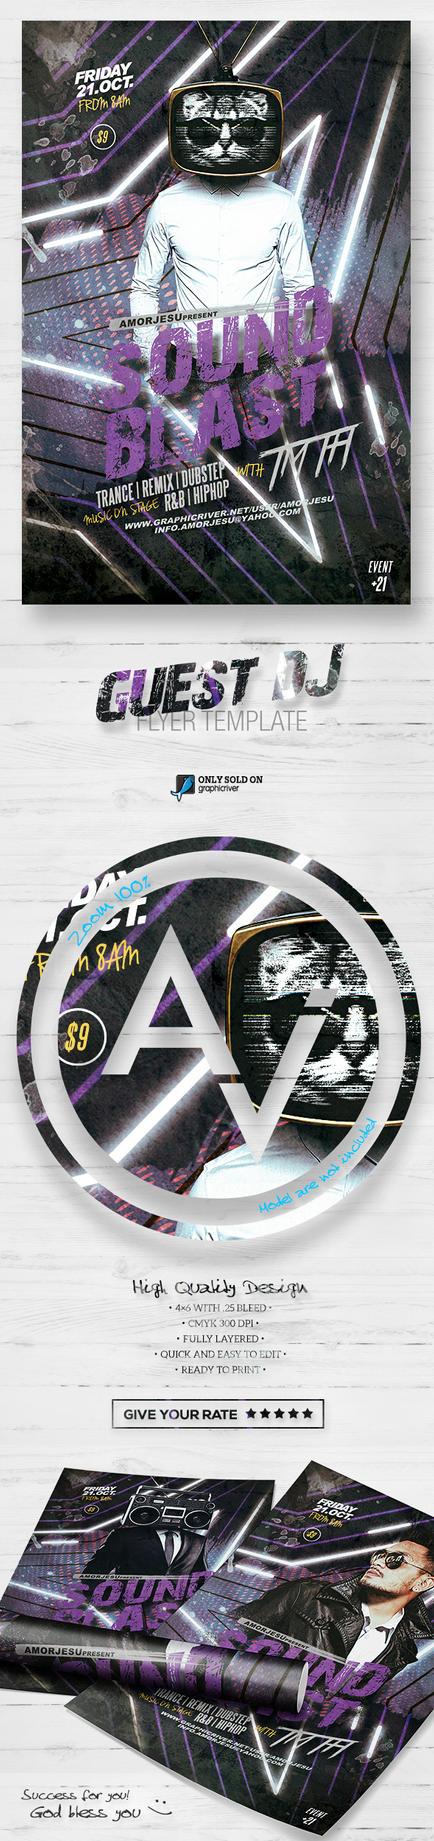 Guest DJ Flyer Template V2 by amorjesu